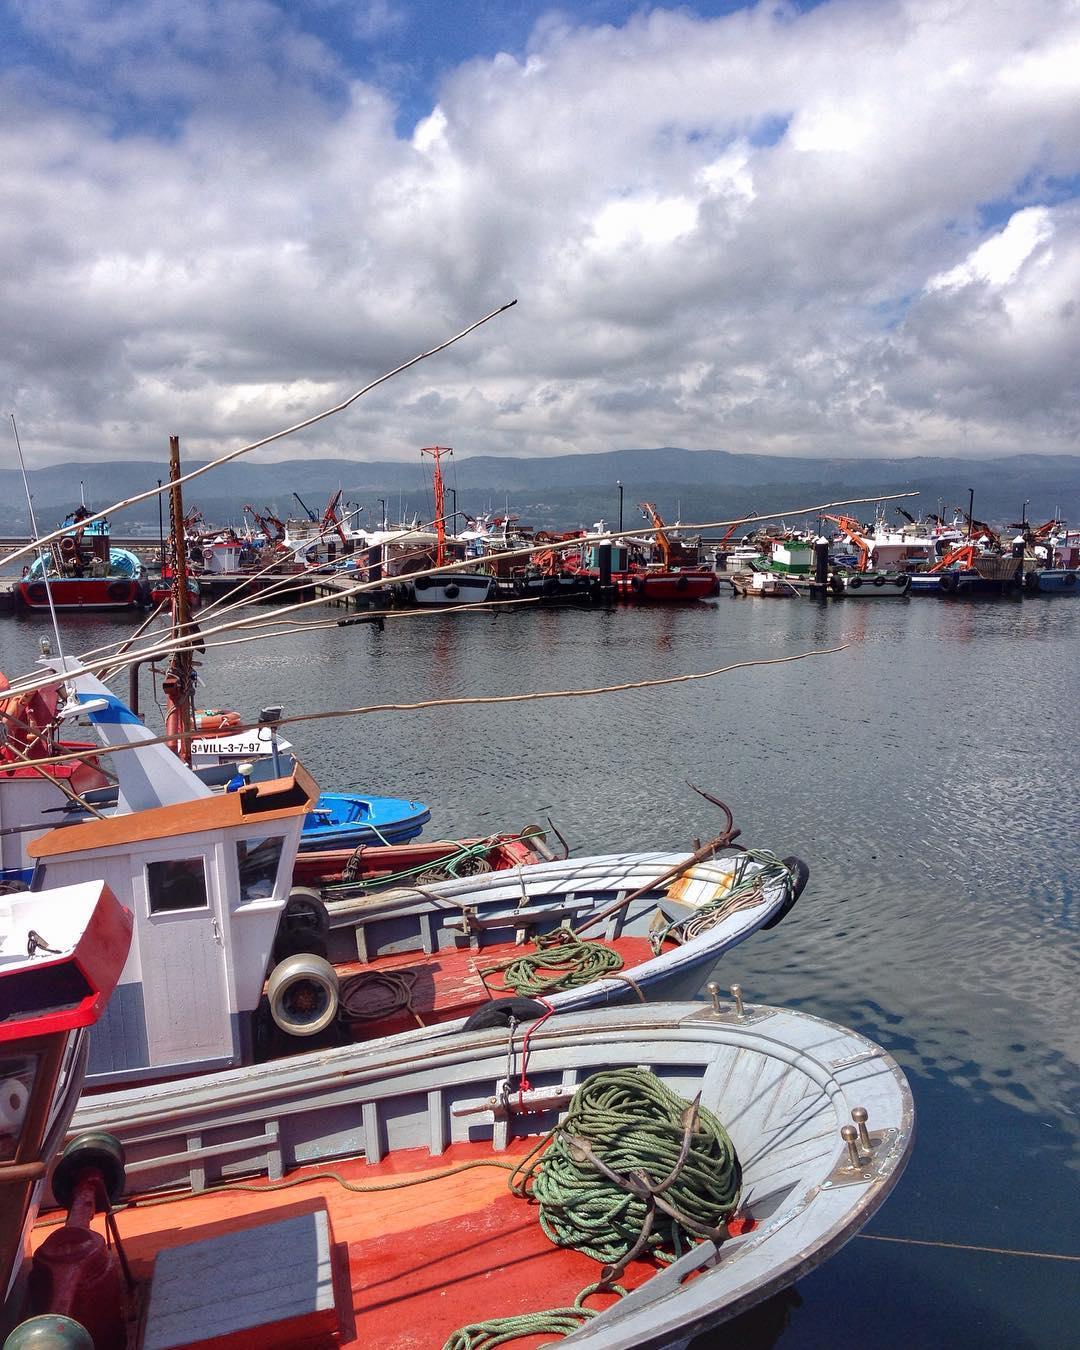 Barcas, aparejos, cañas - Barcas, Aparejos, Cañas